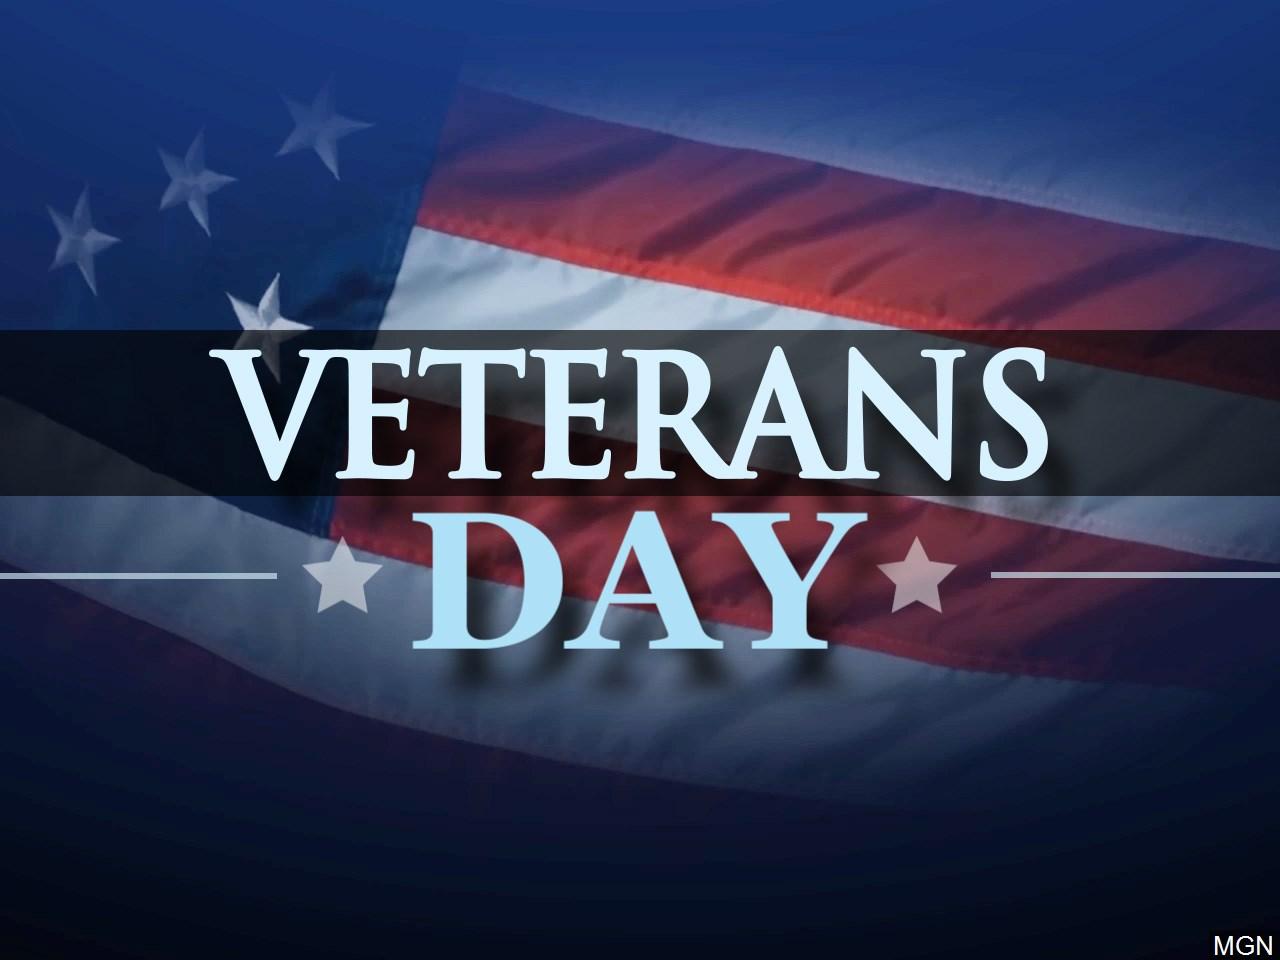 Veterans Day deals in Southwest Florida